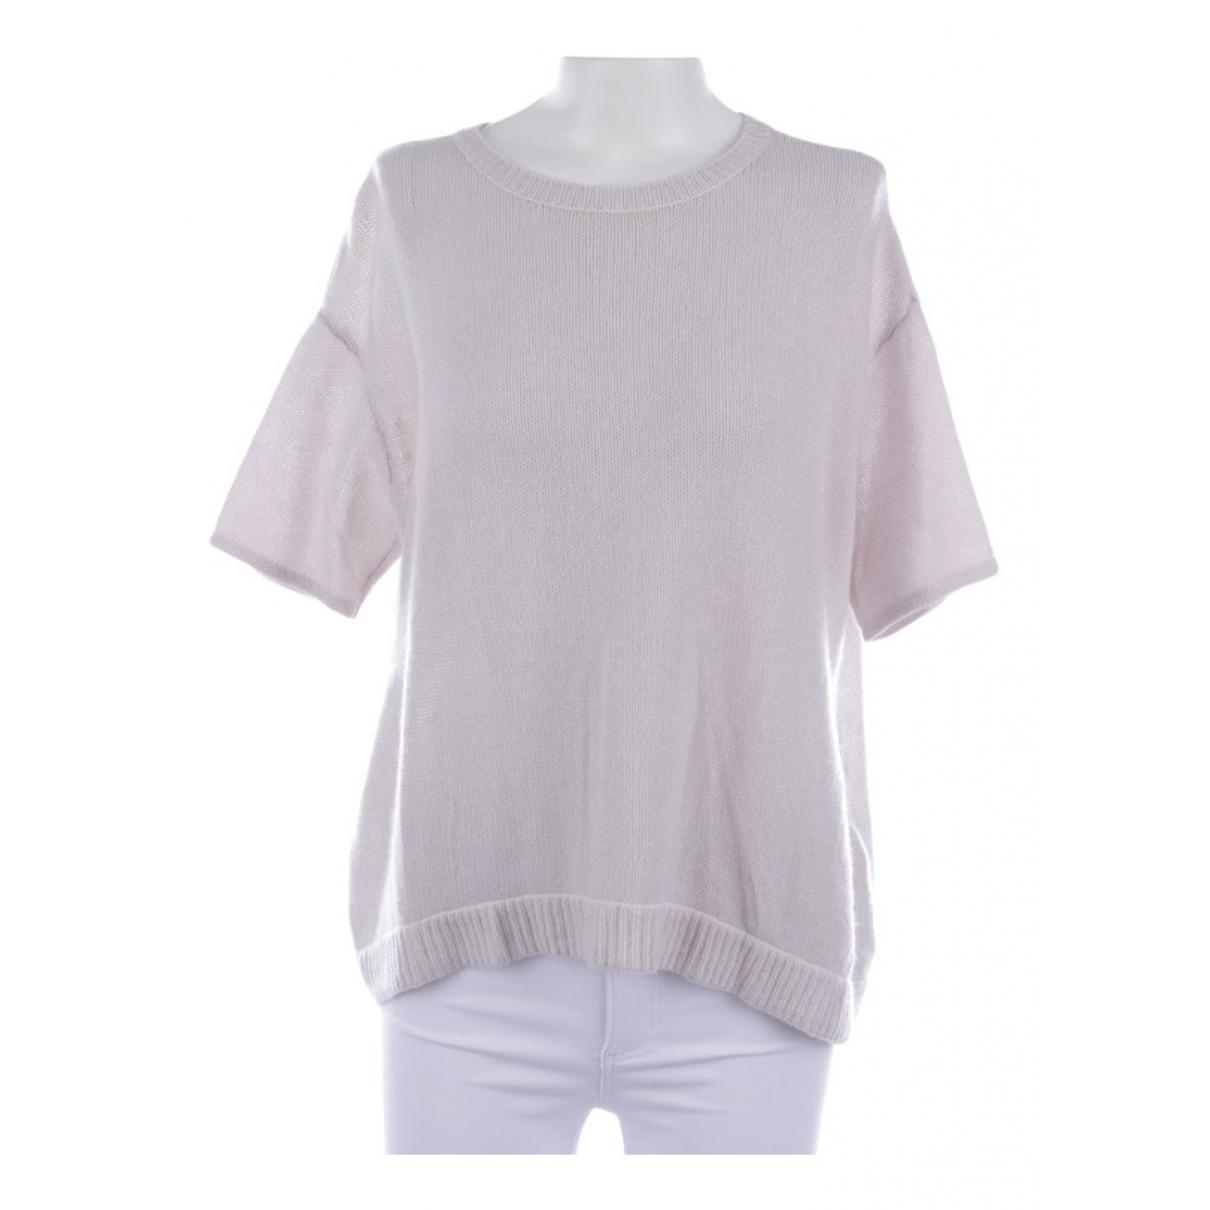 Dorothee Schumacher \N Grey Cashmere Knitwear for Women 38 FR